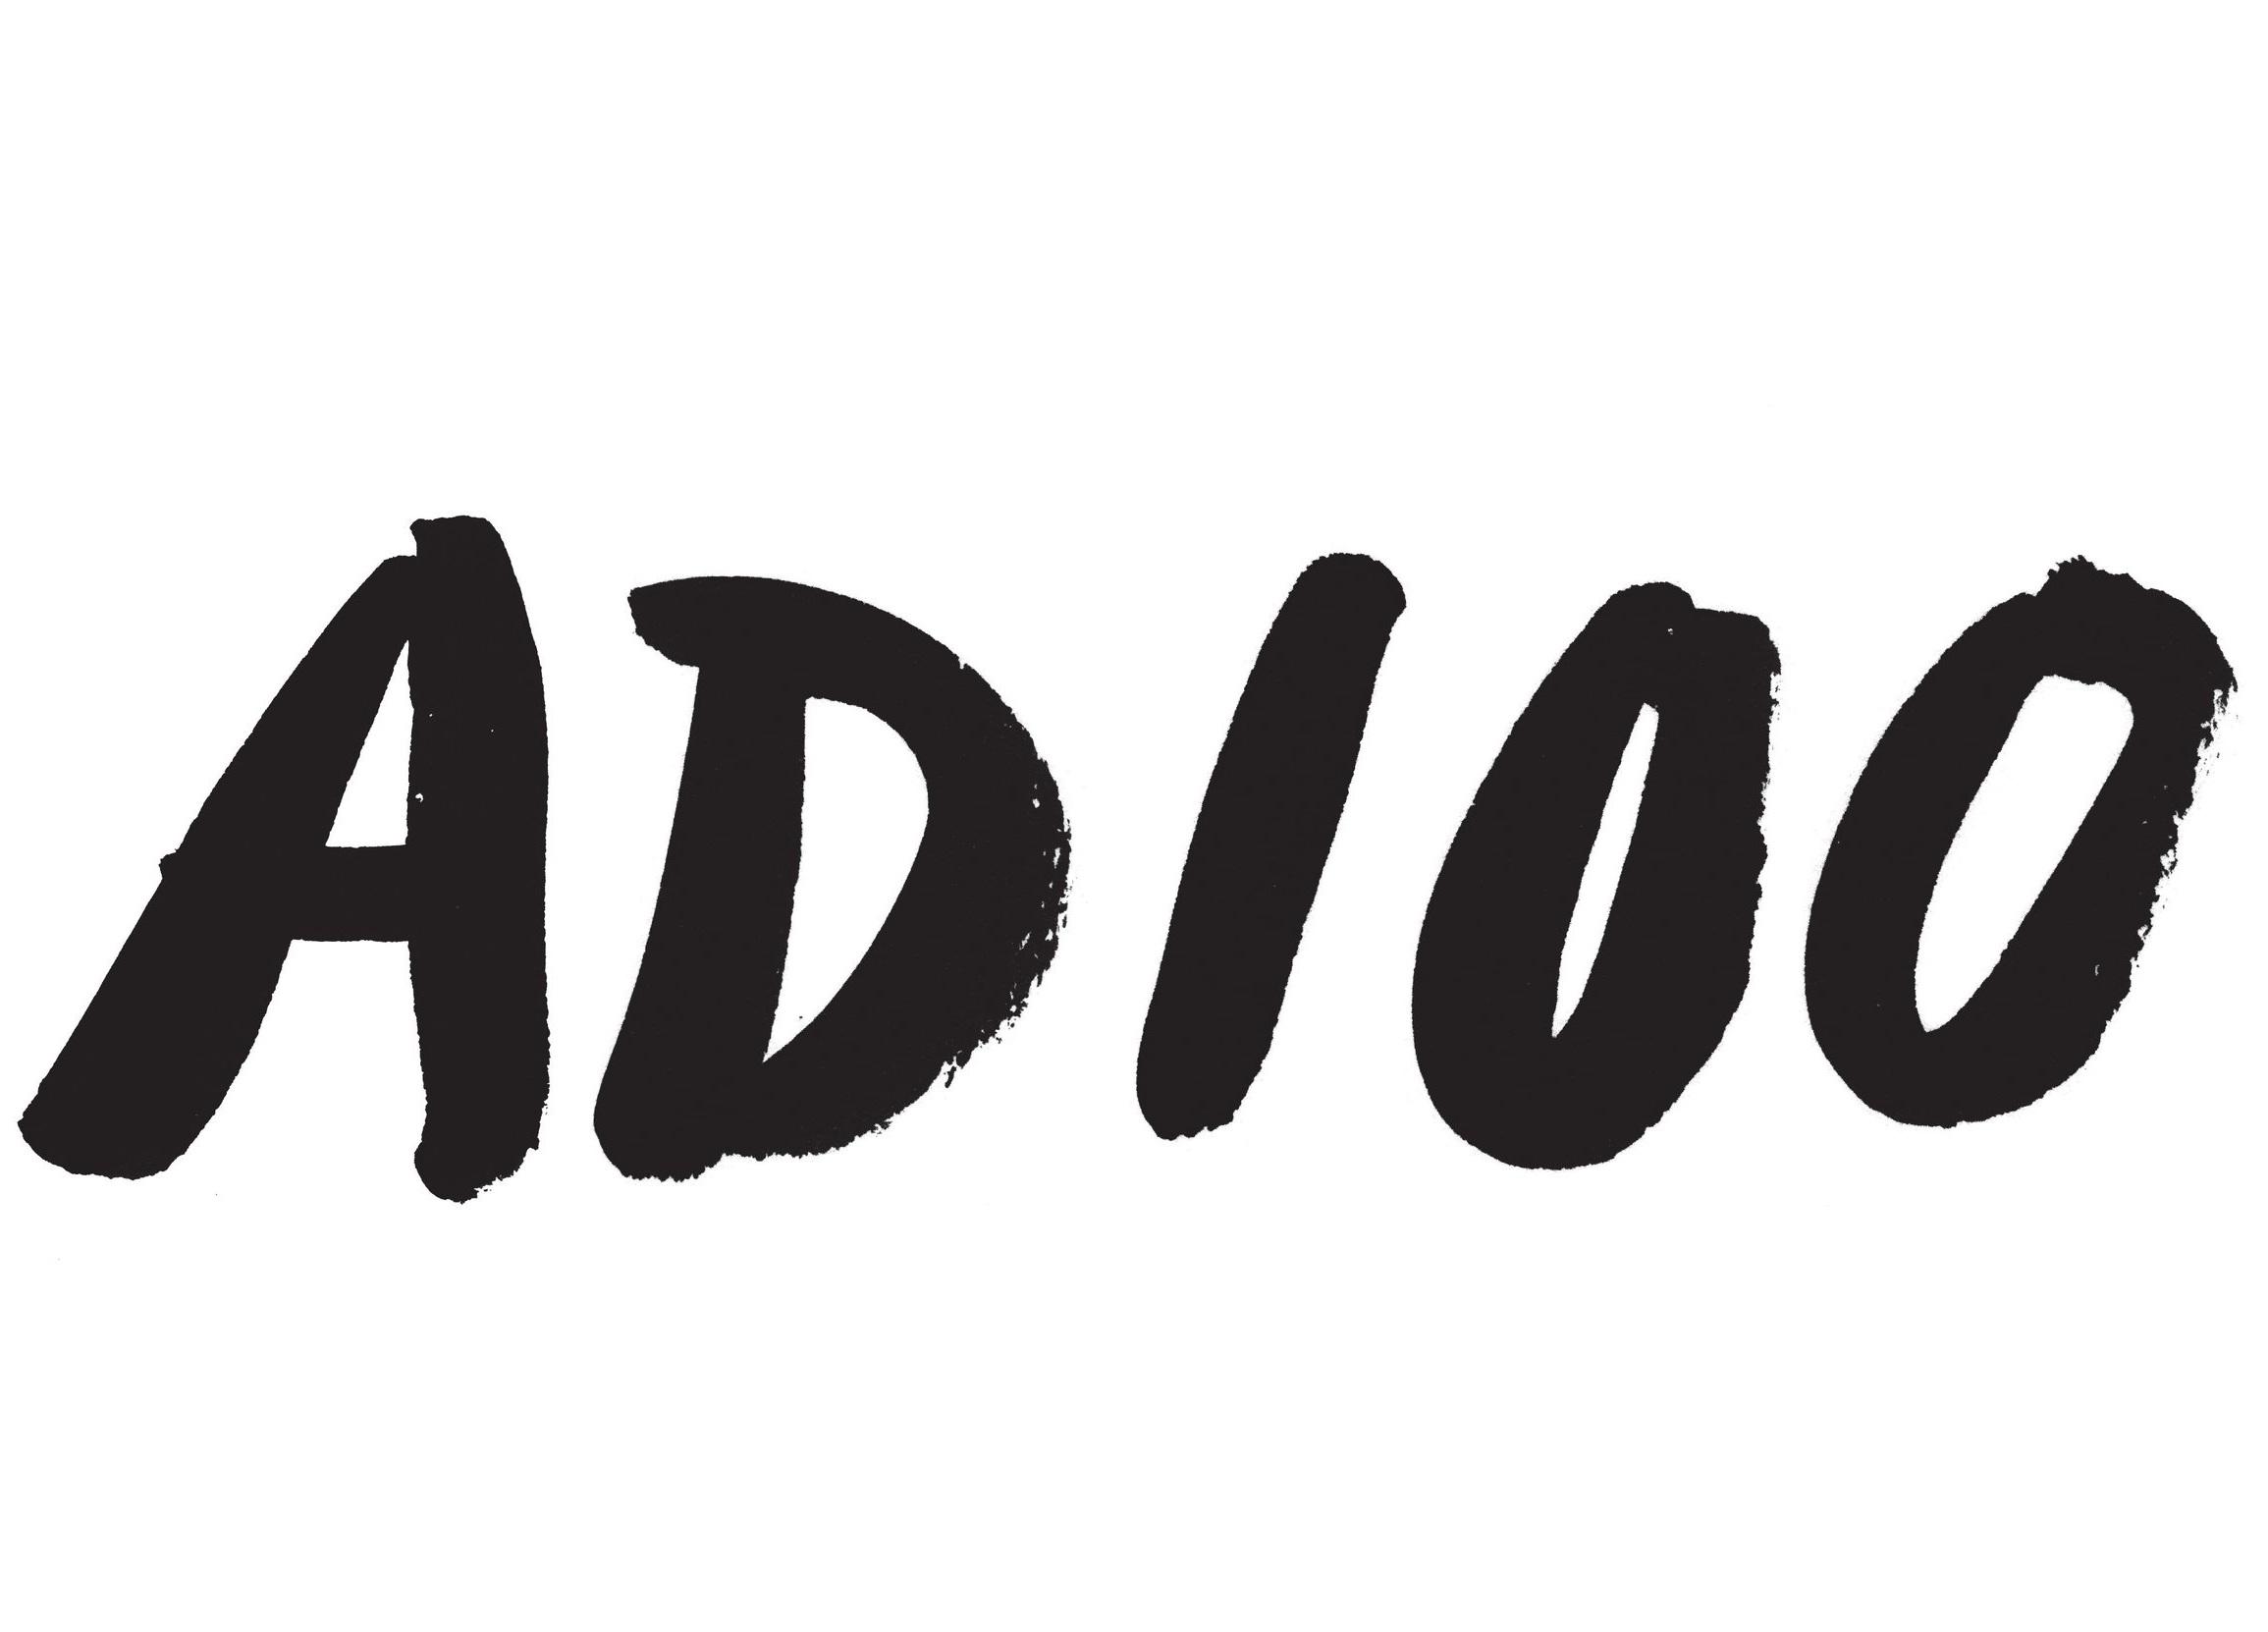 ad-100-logo-large-3000h.jpg